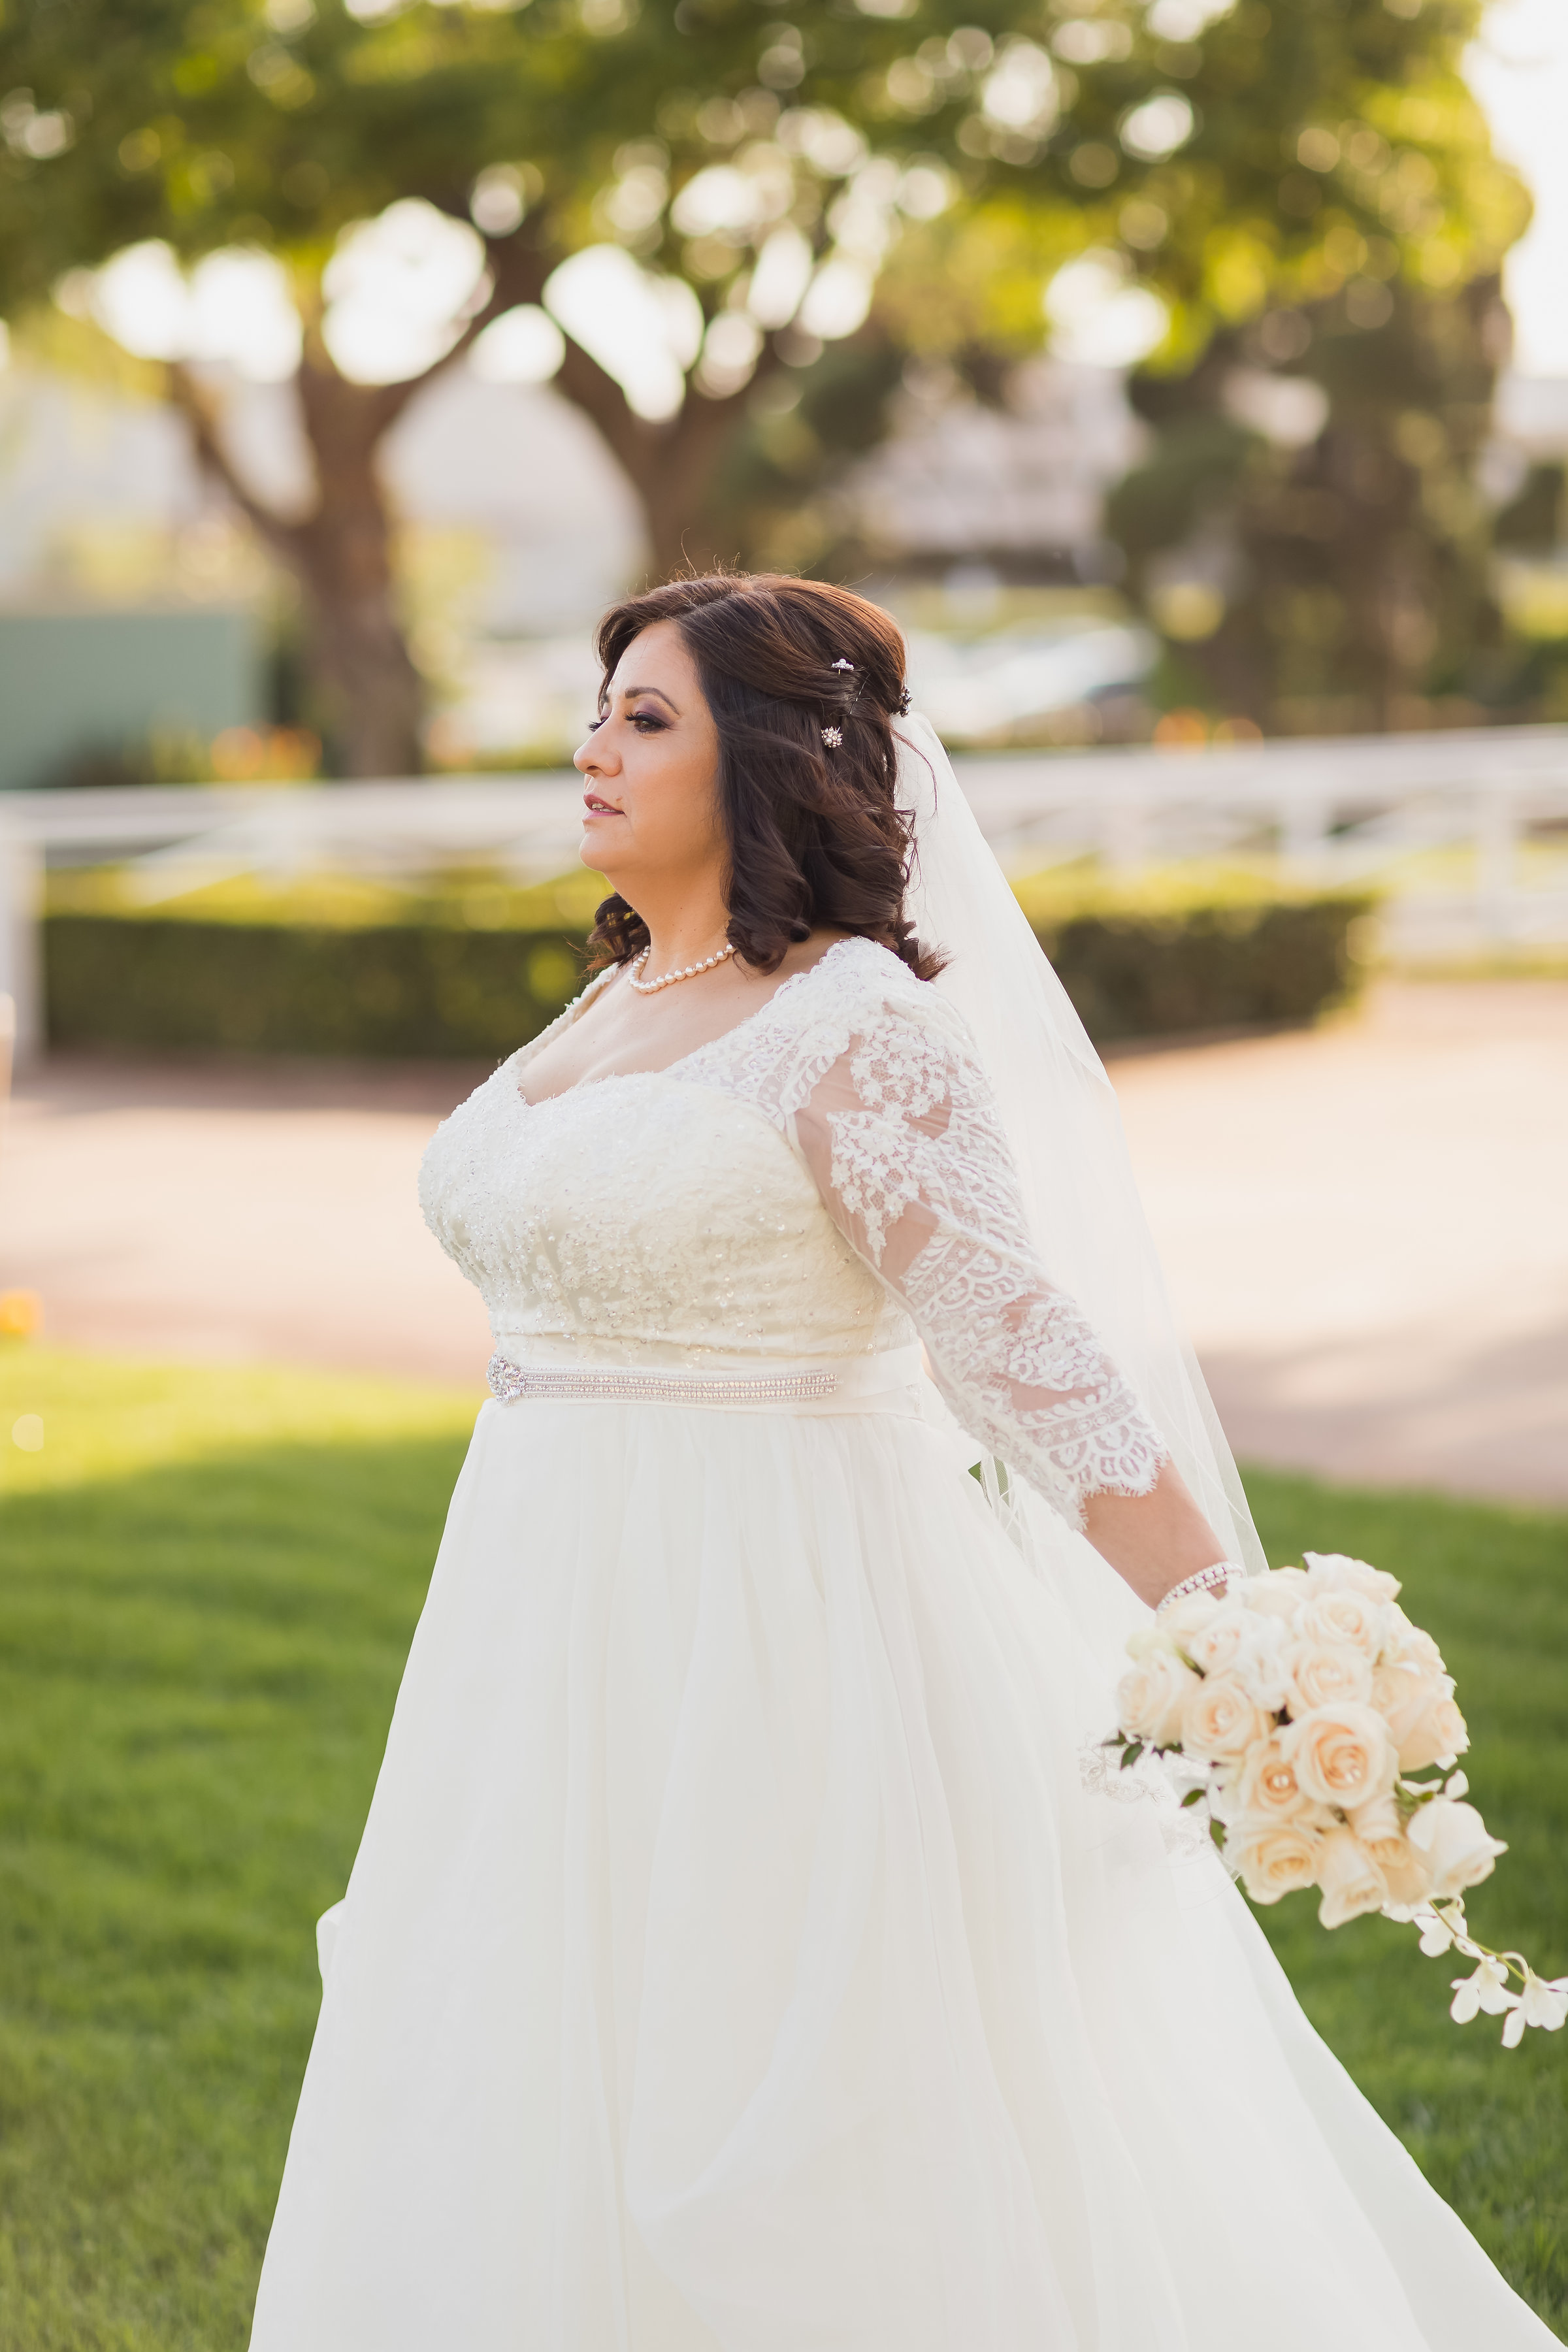 Beautiful Wedding Portraits of Older Brides.jpg